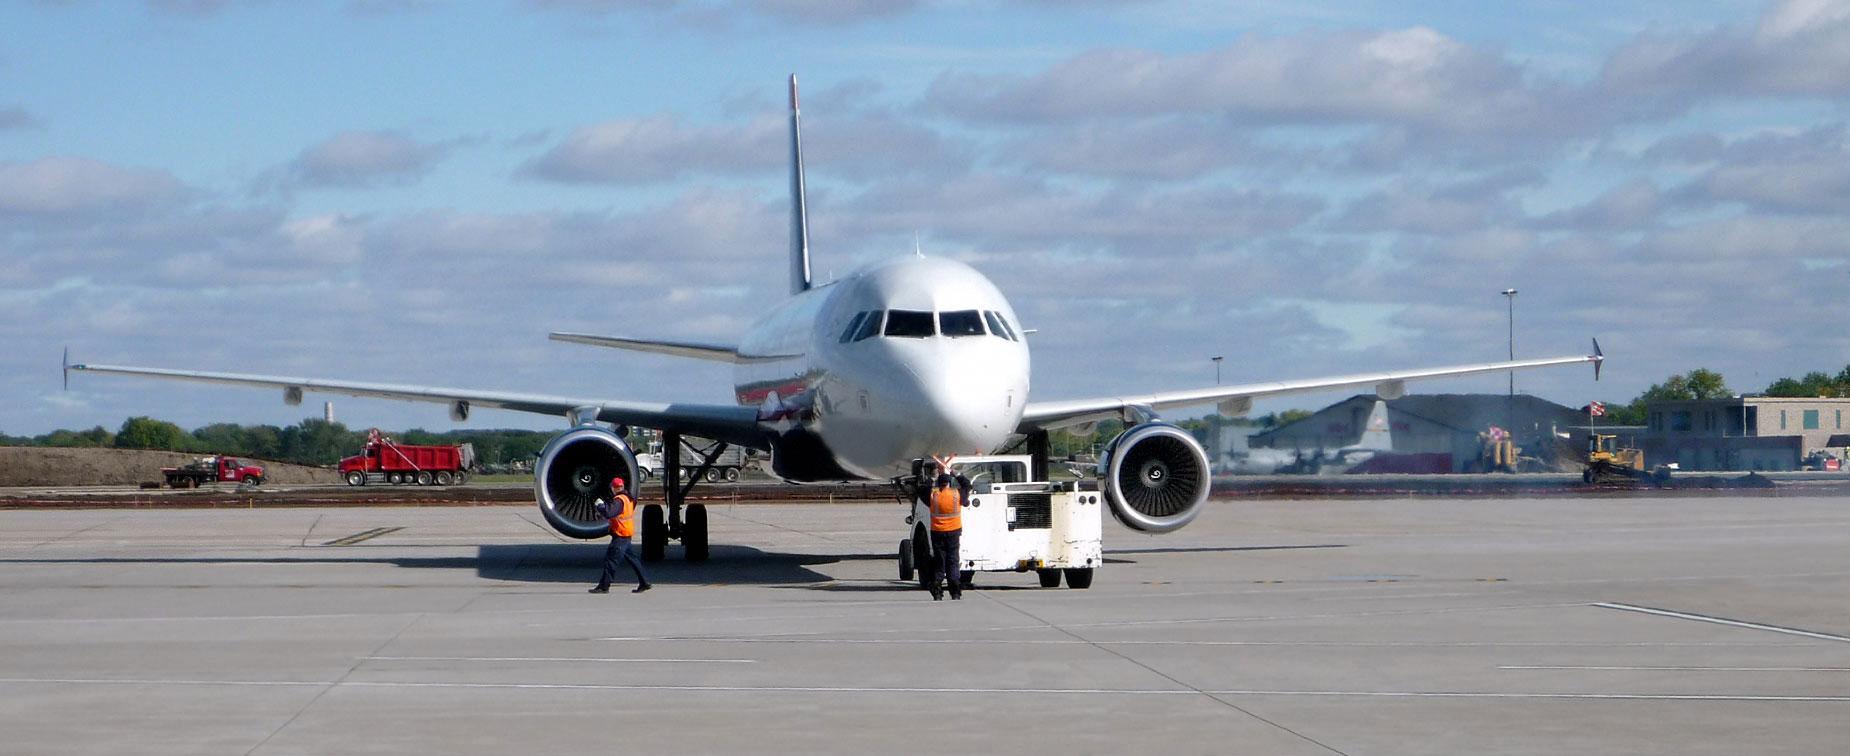 Jet plane at airport